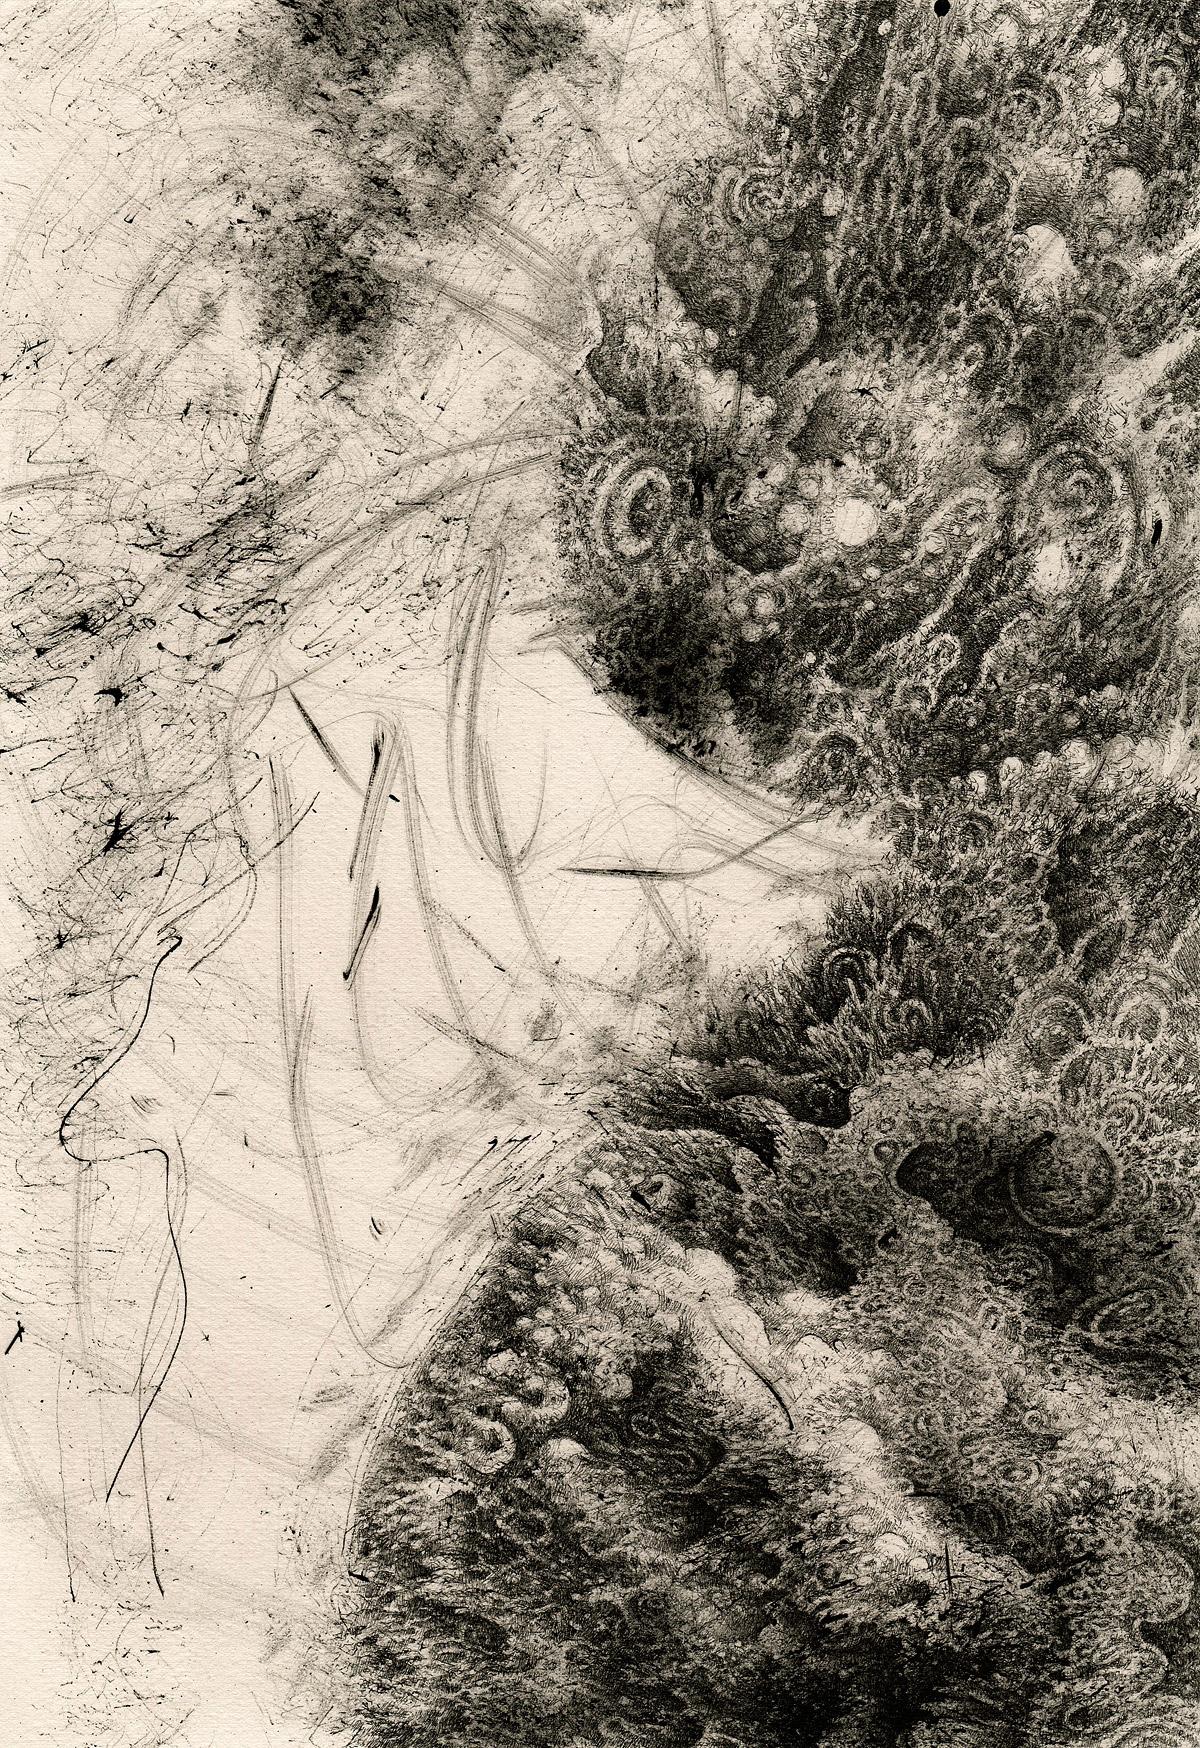 ink dip pen nib pen black & white artwork abstract detailed